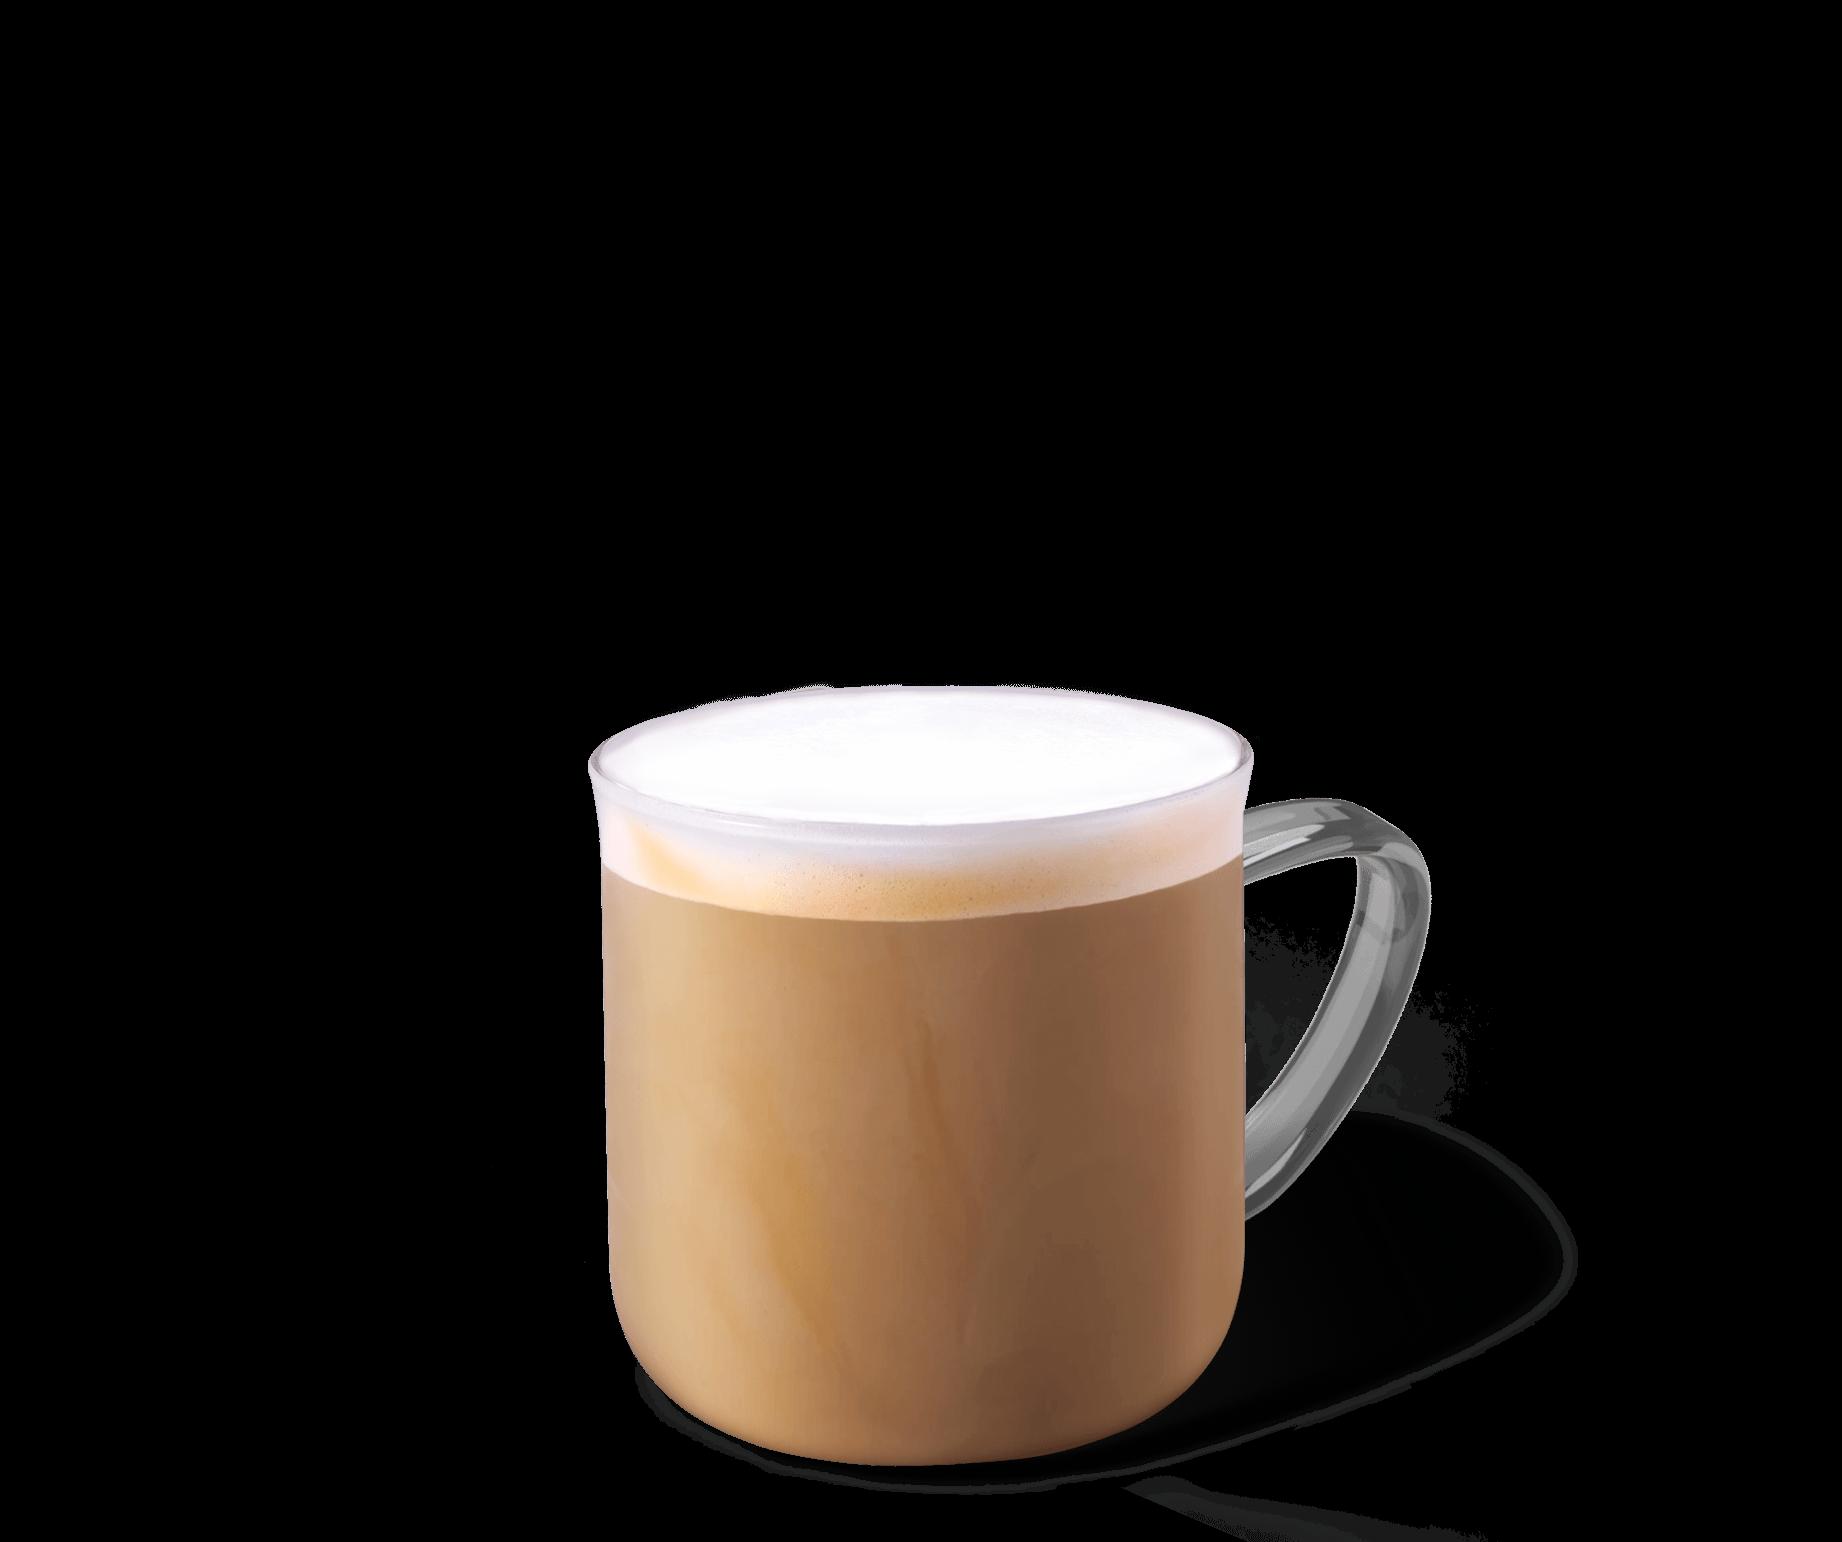 Vanilla Latte_LongShadow_Cream.png